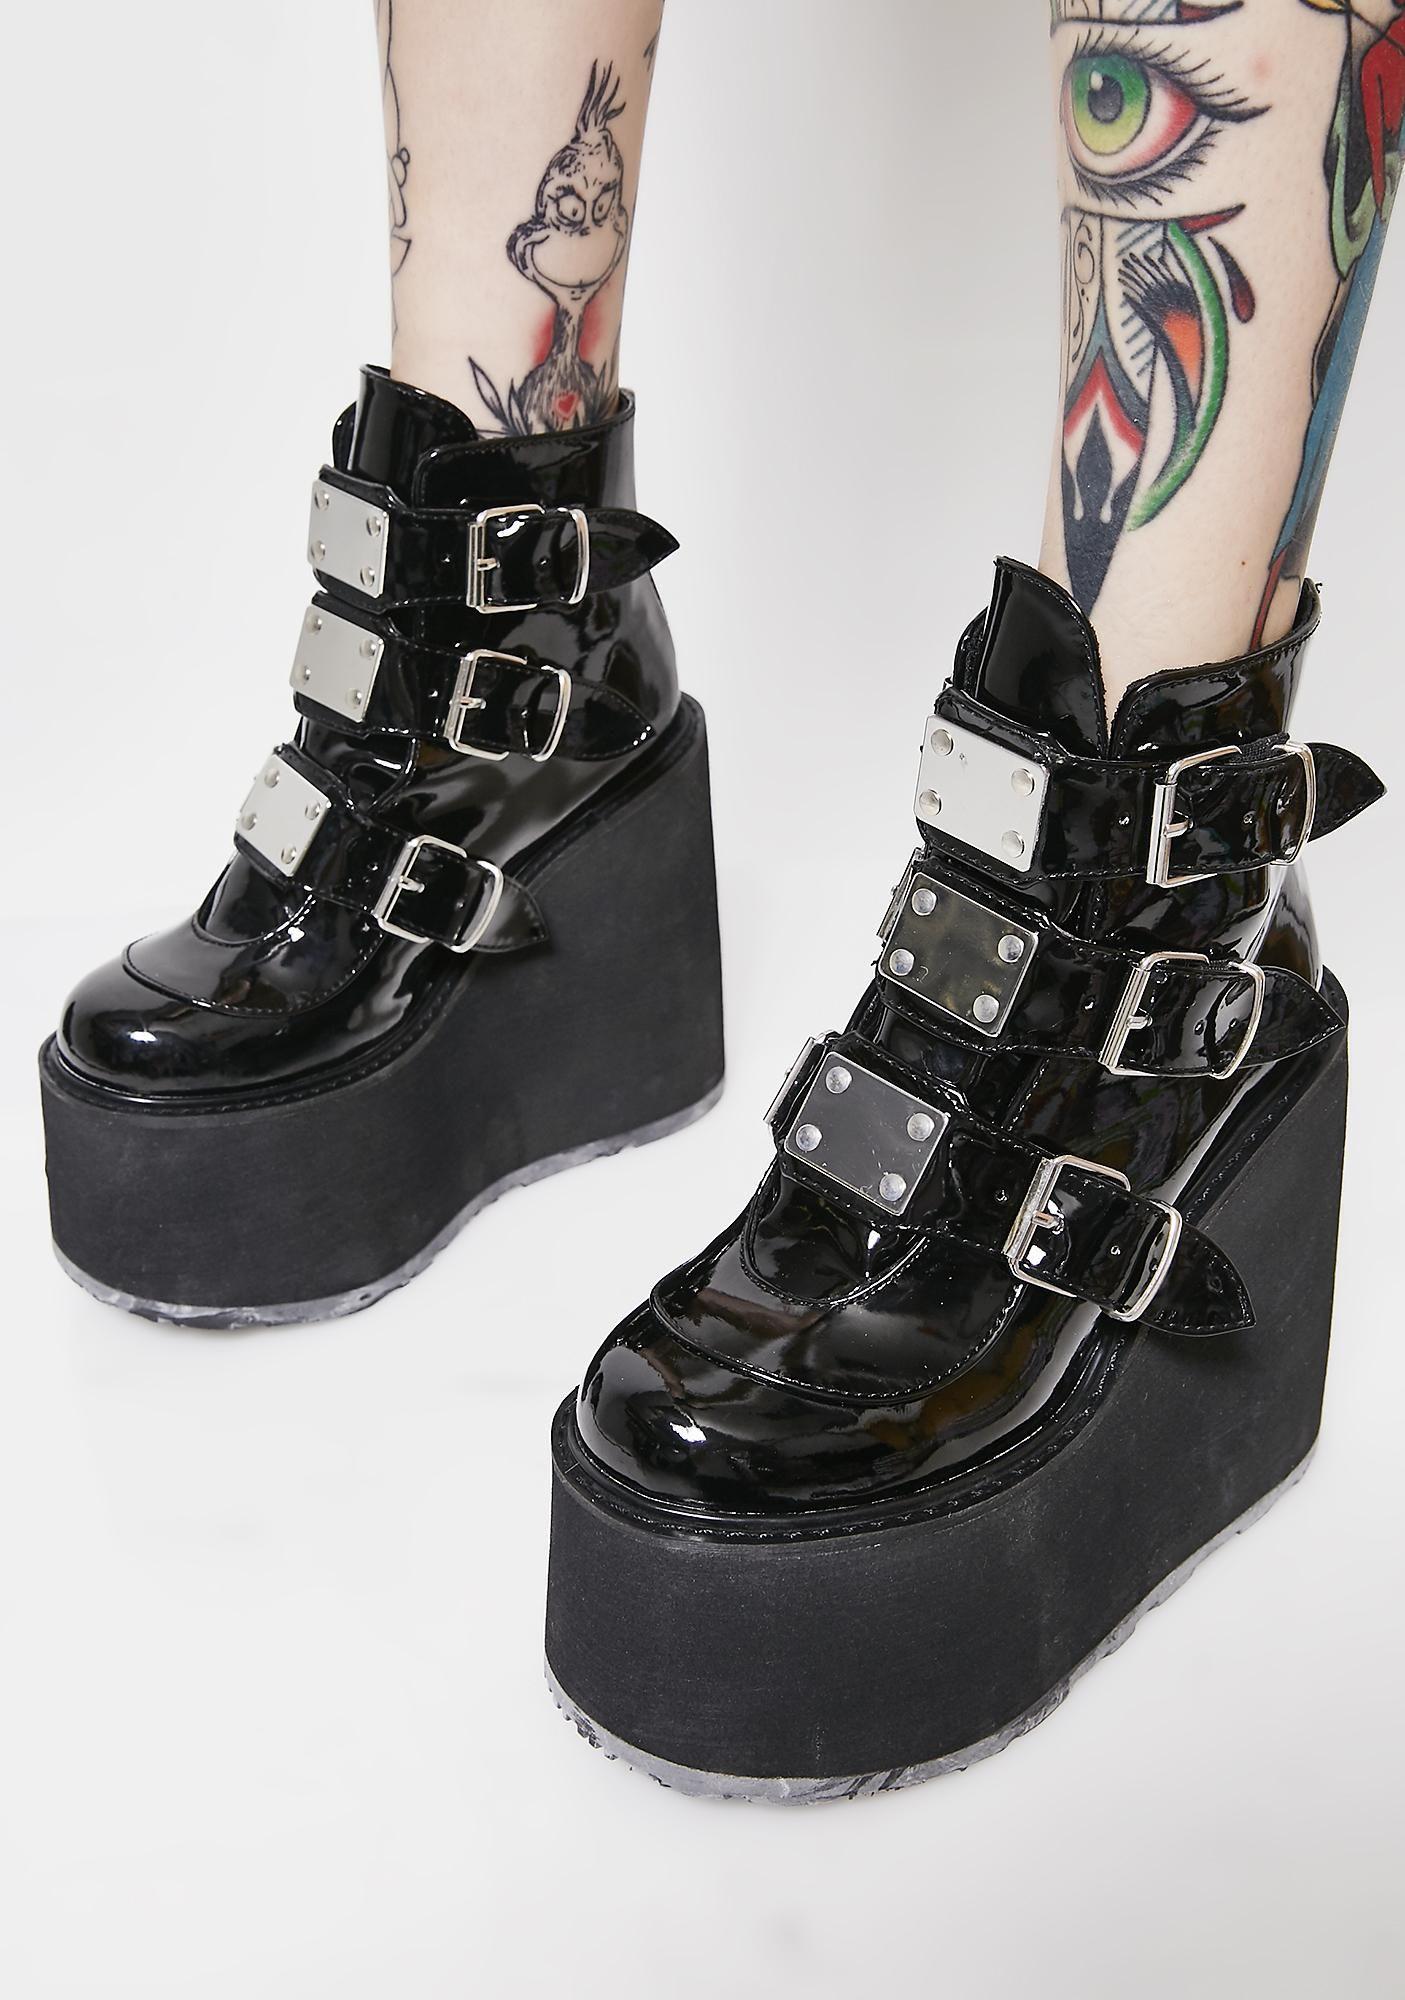 7e6a111525e Demonia Low Trinity Boots have ya entering the matrix